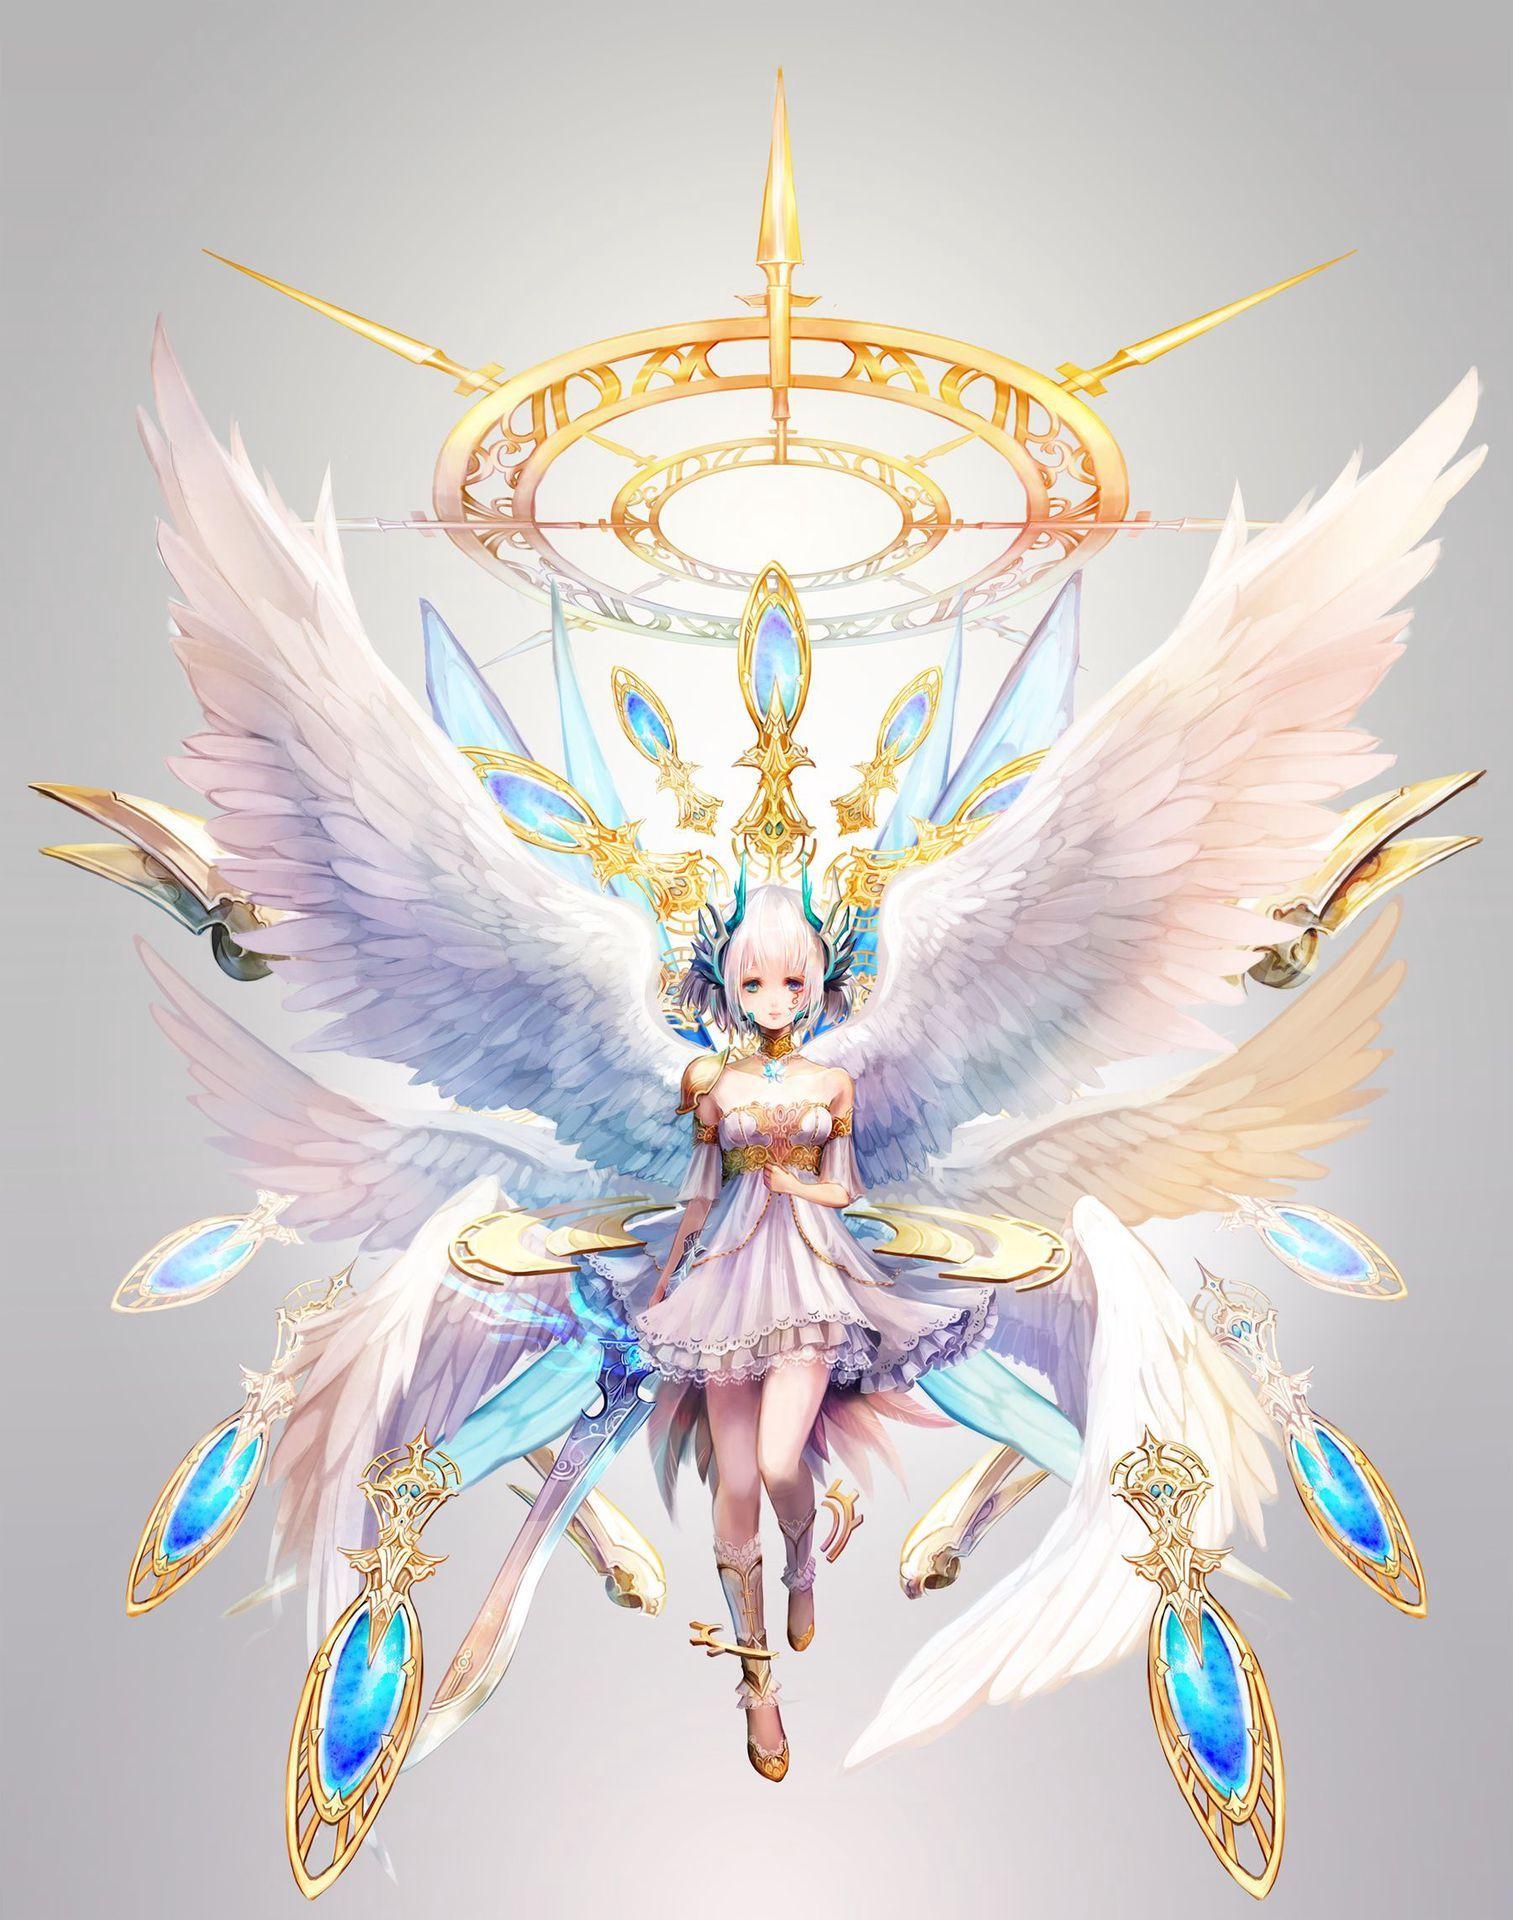 Angel Anime Wings : angel, anime, wings, Anime